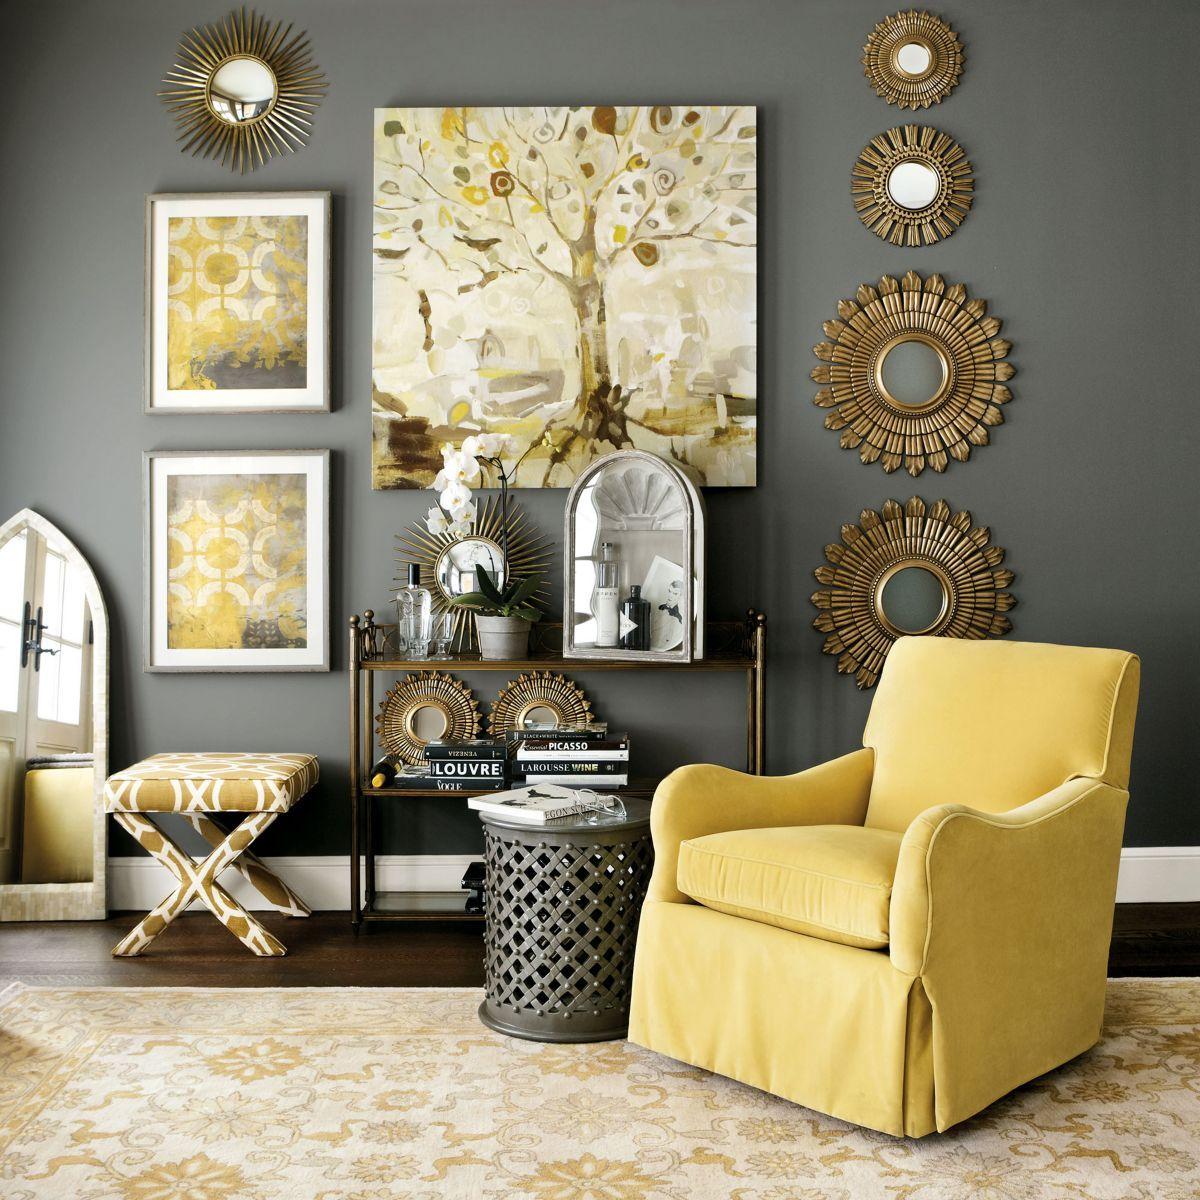 Living room furniture decor ballard designs also best home images on pinterest ideas rh